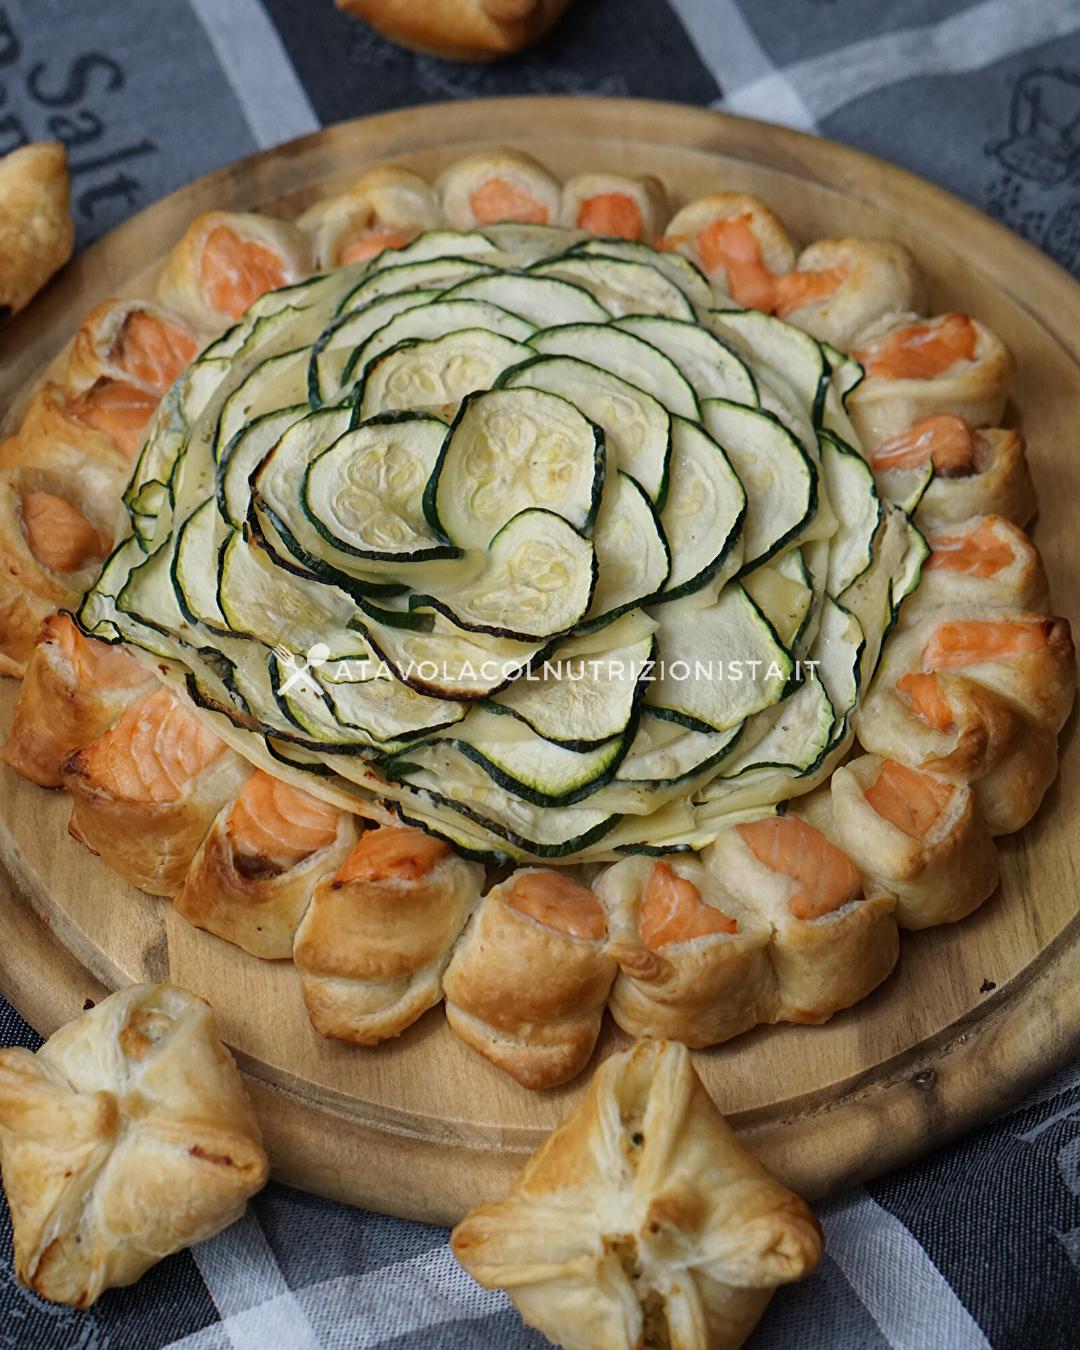 Ricetta Quiche Salmone E Zucchine.Ricetta Light Torta Salata Salmone E Zucchine A Tavola Col Nutrizionista